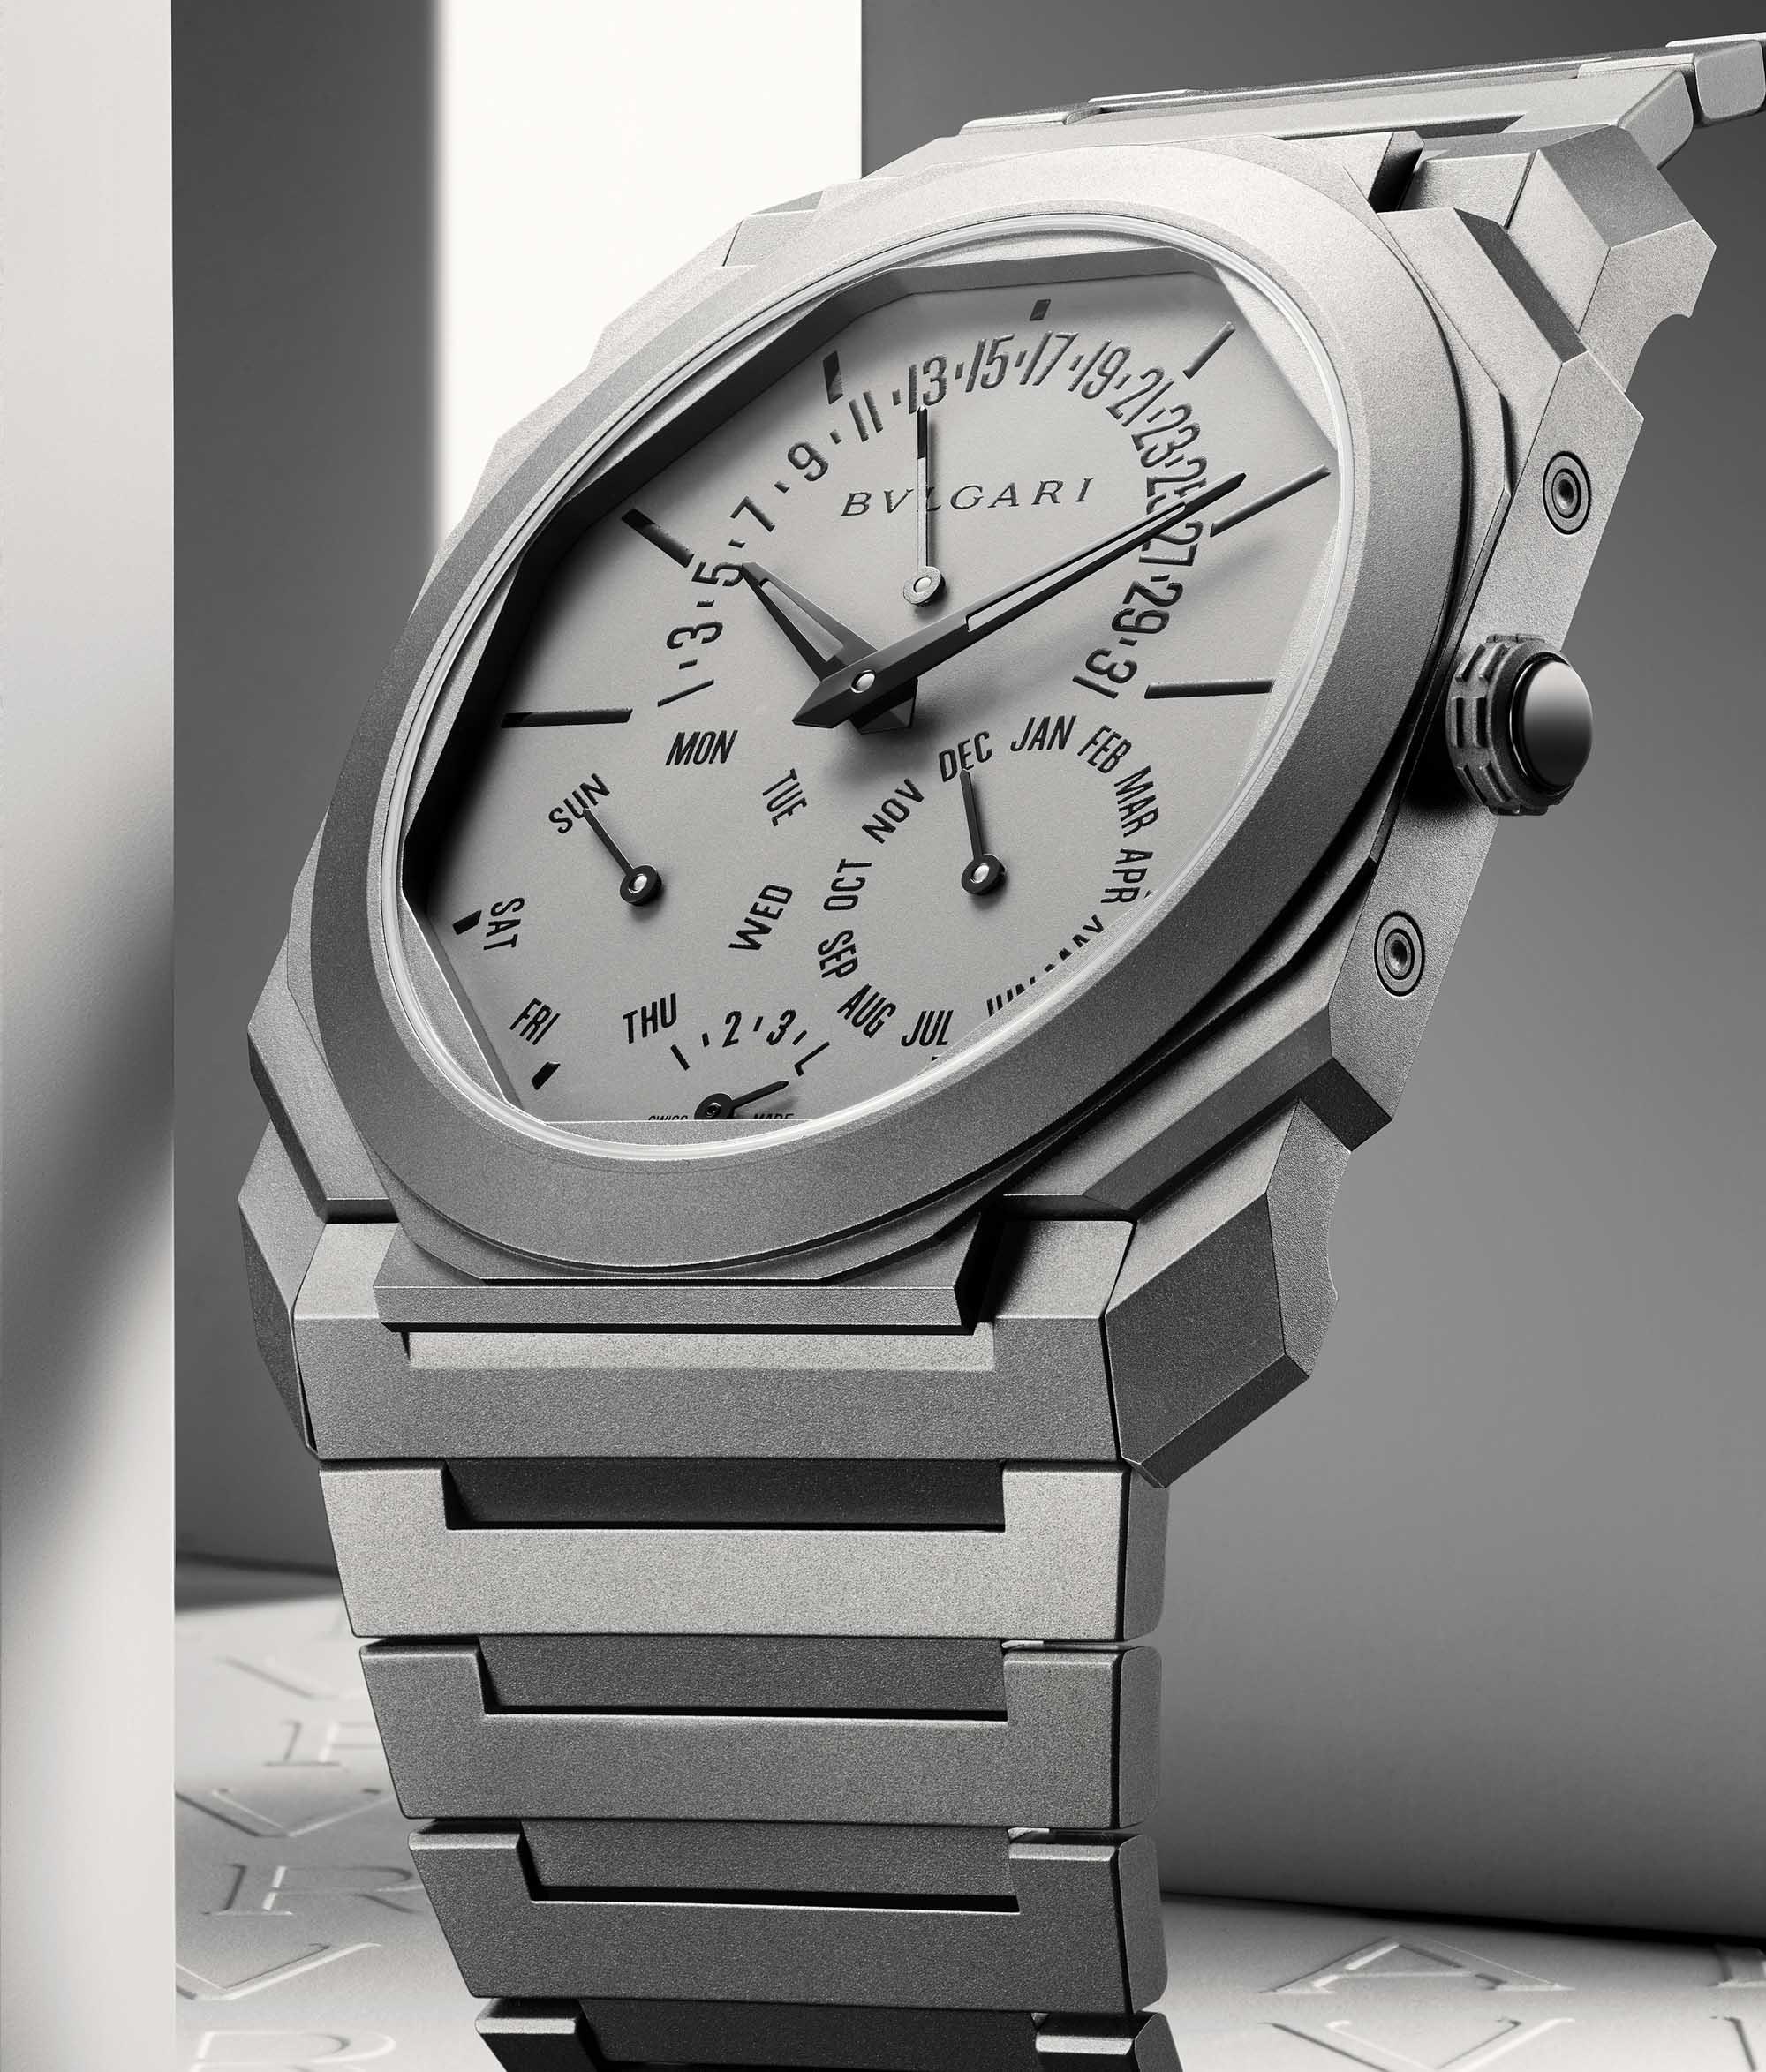 Bulgari Octo Finissimo Perpetual Calendar Watch–Ultra Thin World Record Dress Watch 2021 2